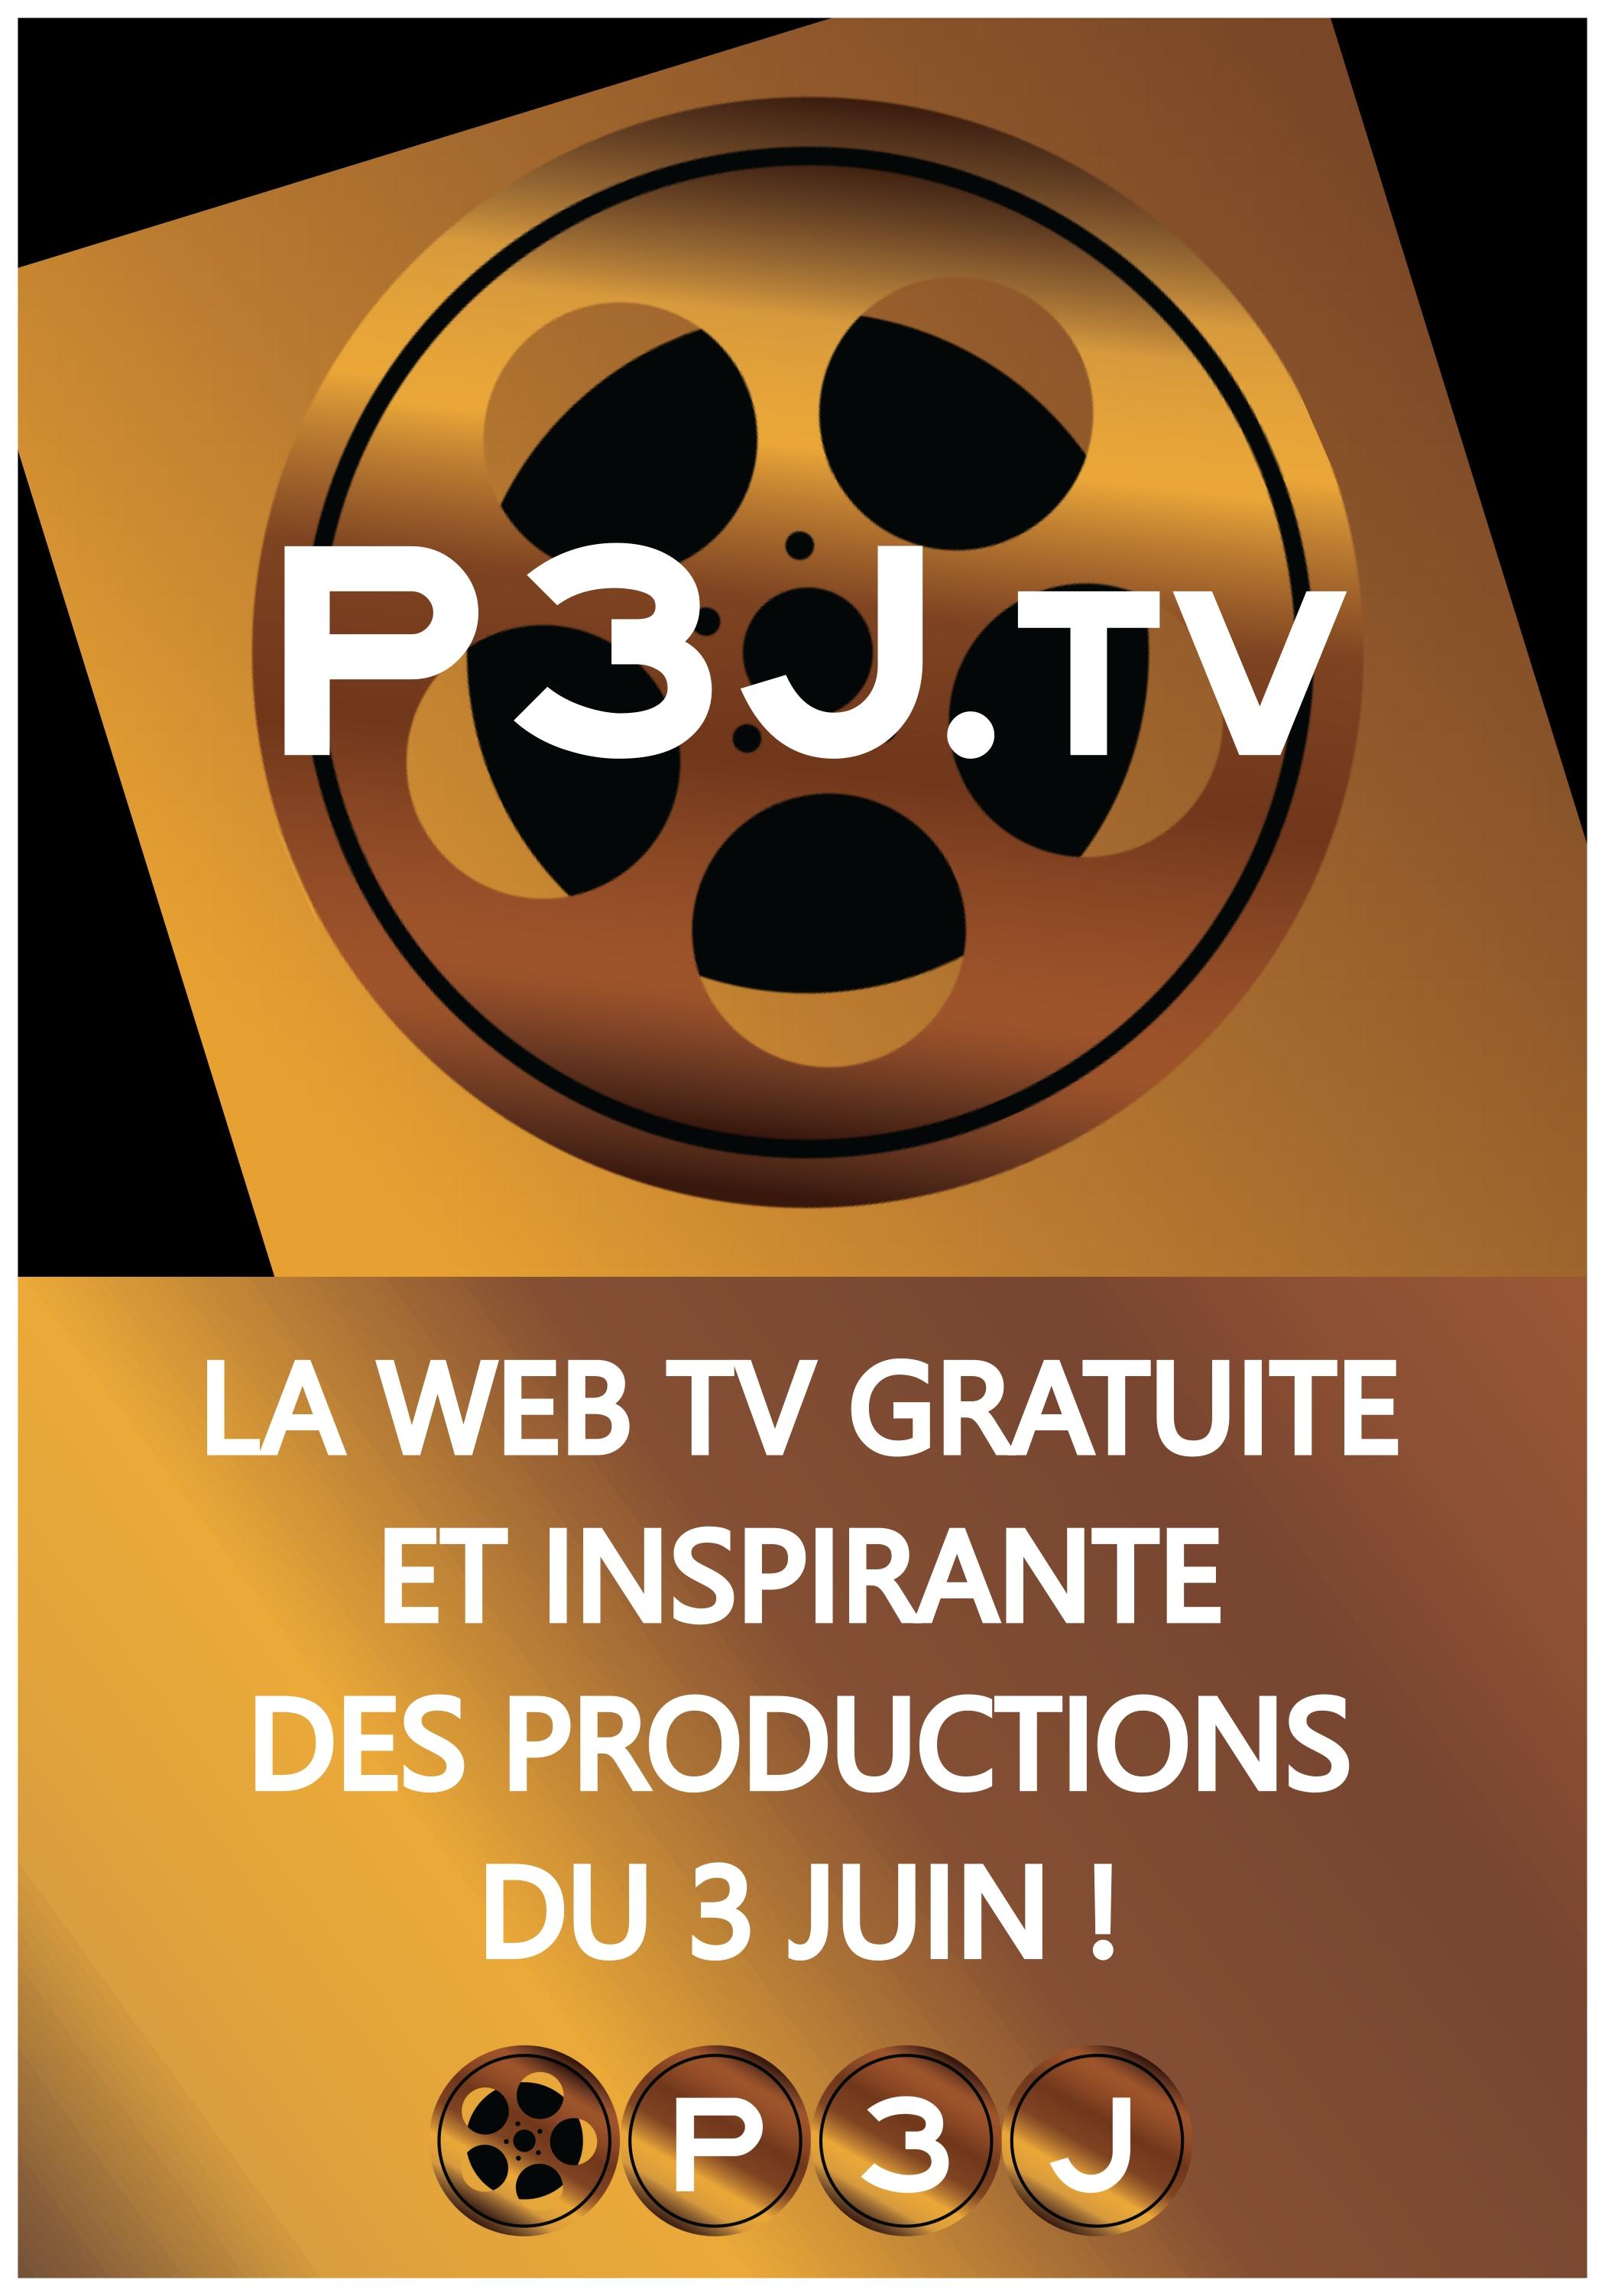 P3J.tv - La web tv gratuite et inspirante